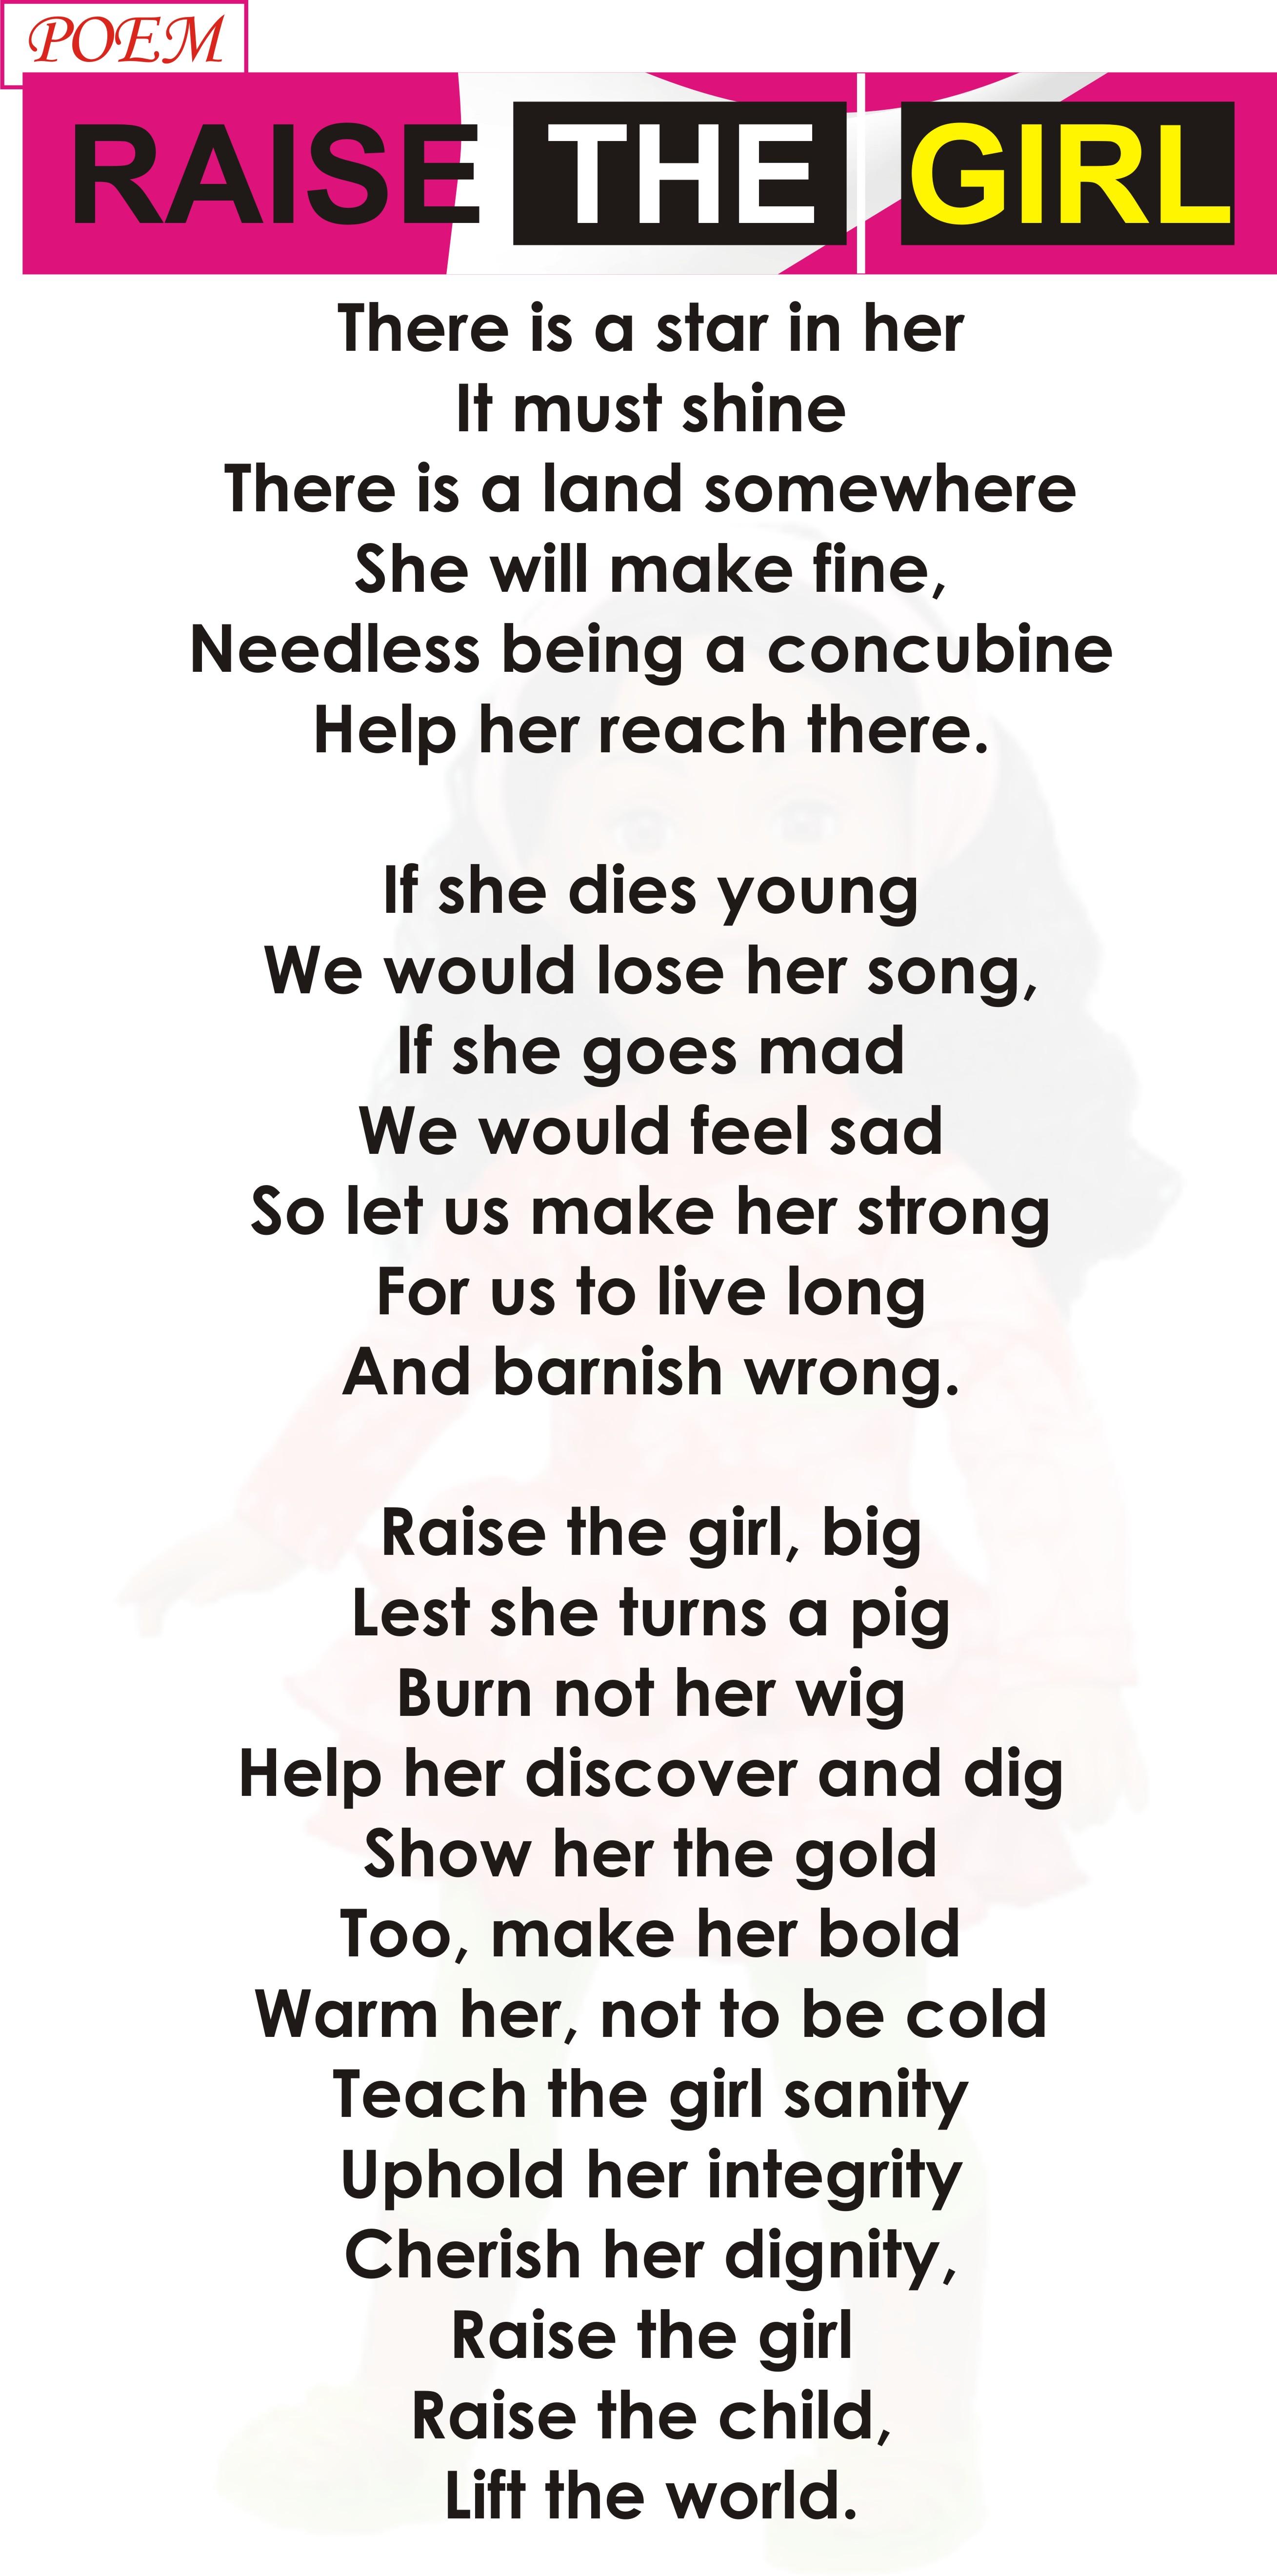 POEM – RAISE THE GIRL